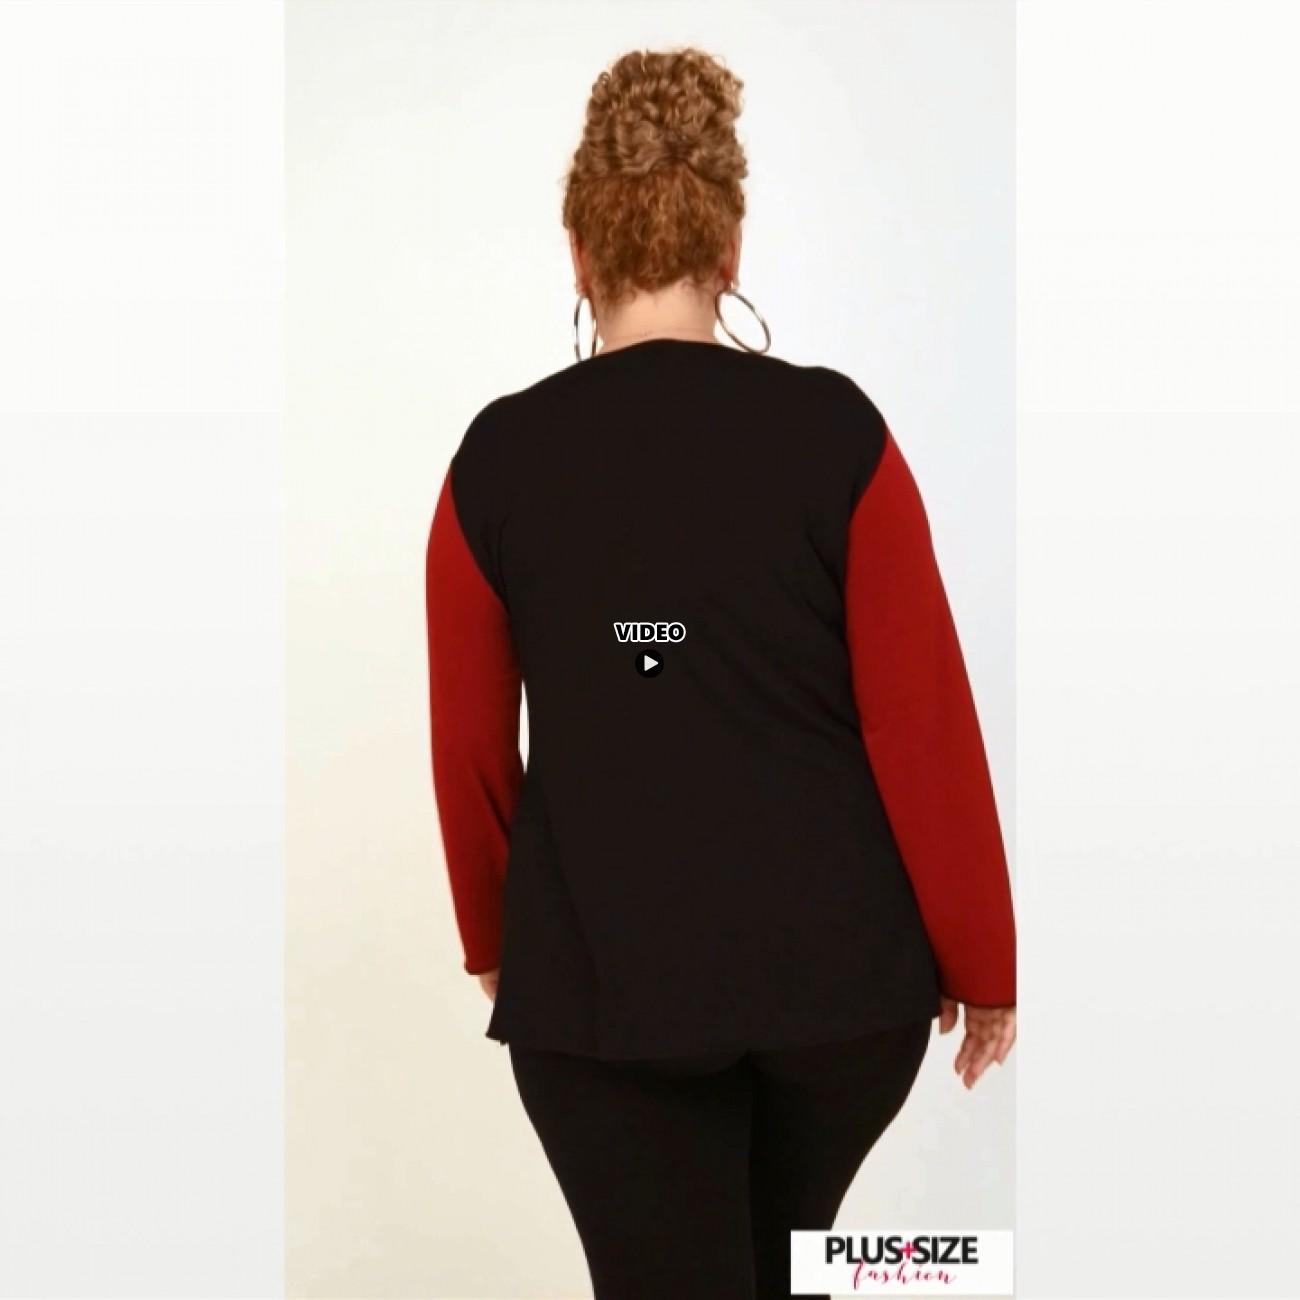 B20-190D Jersey Blouse with zipper - Brown